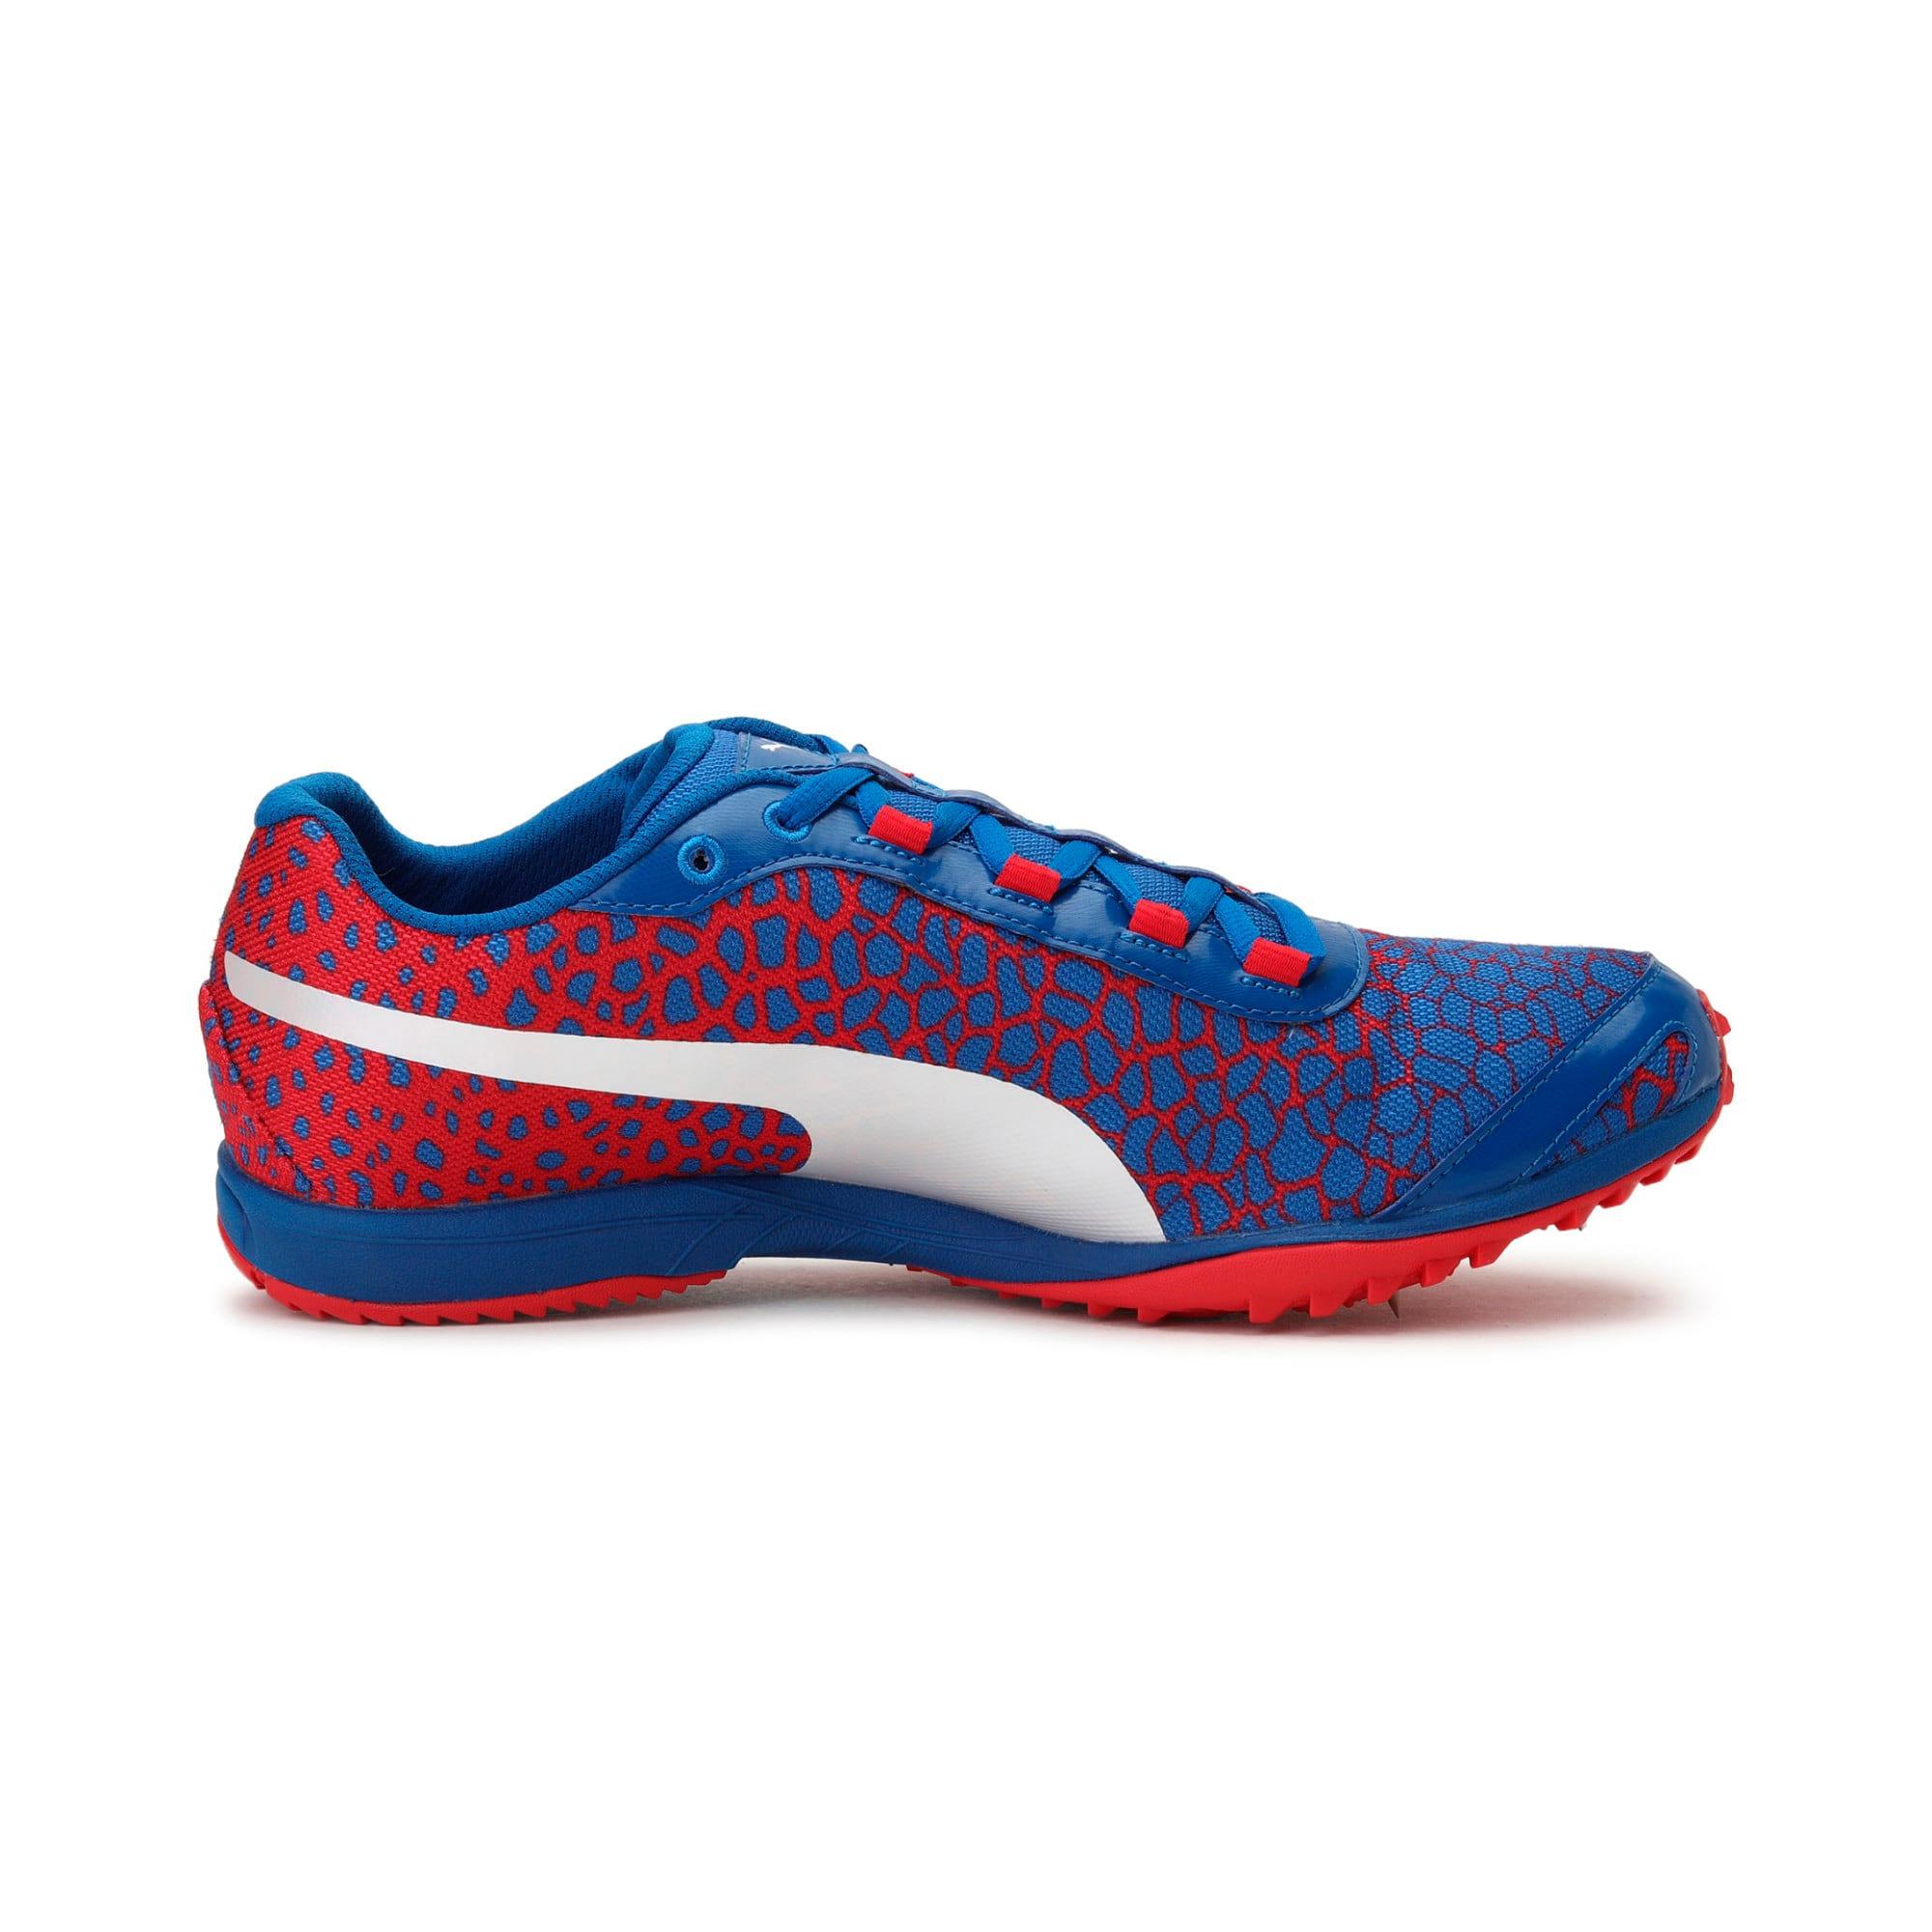 Thumbnail 4 of evoSPEED Haraka 4 Men's Cross Country Running Shoes, Lapis Blue-Toreador, medium-IND